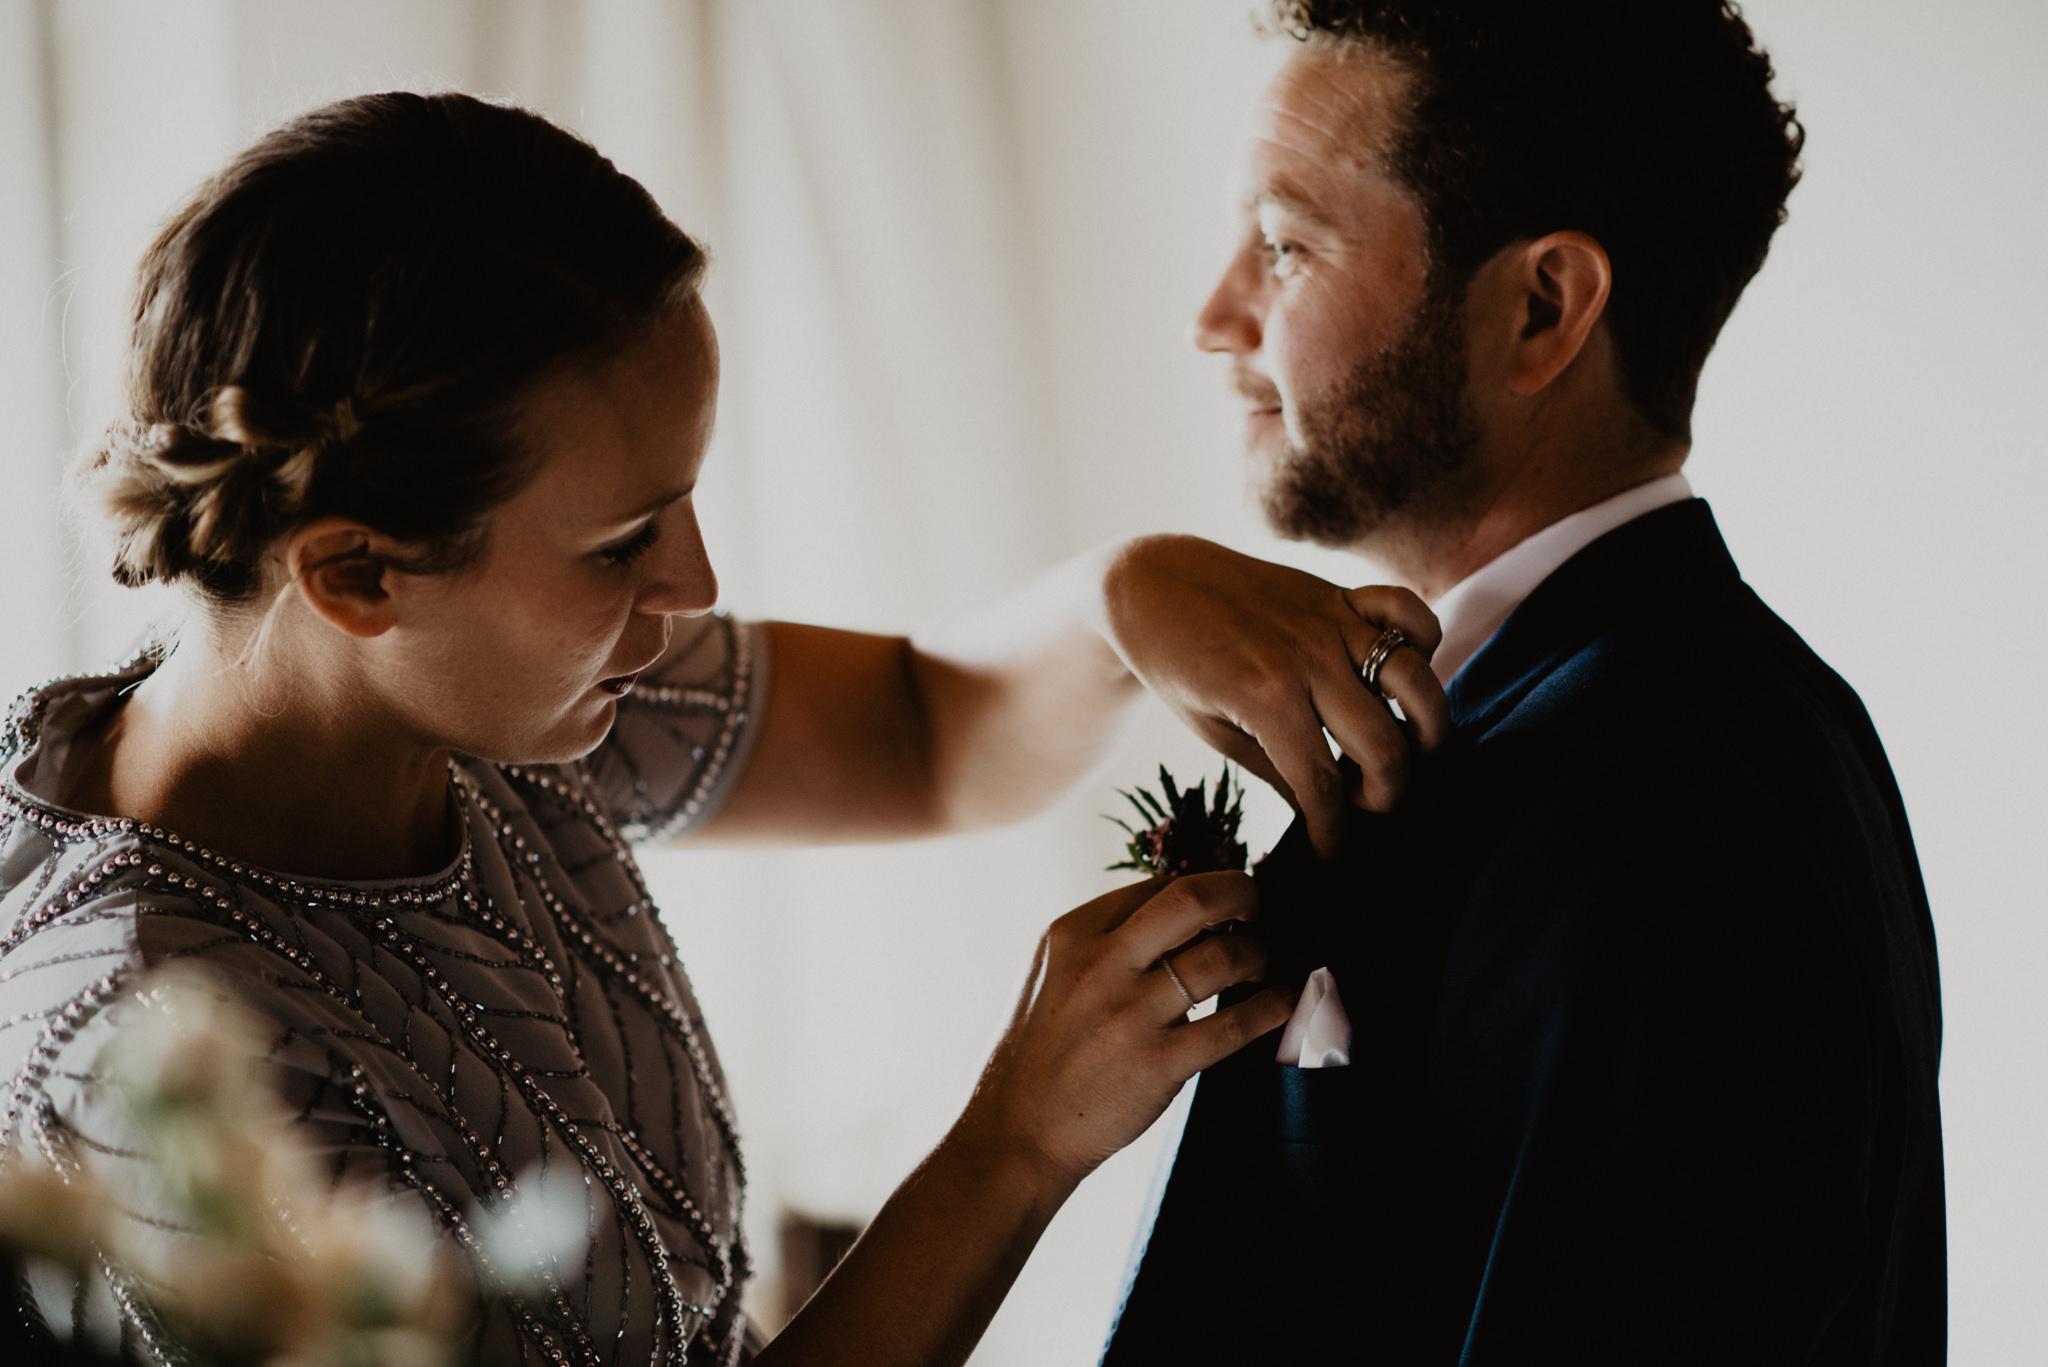 bohemiskt-bröllop-på-nygård-event-i-åstorp-bröllopsfotograf-skåne-57.jpg